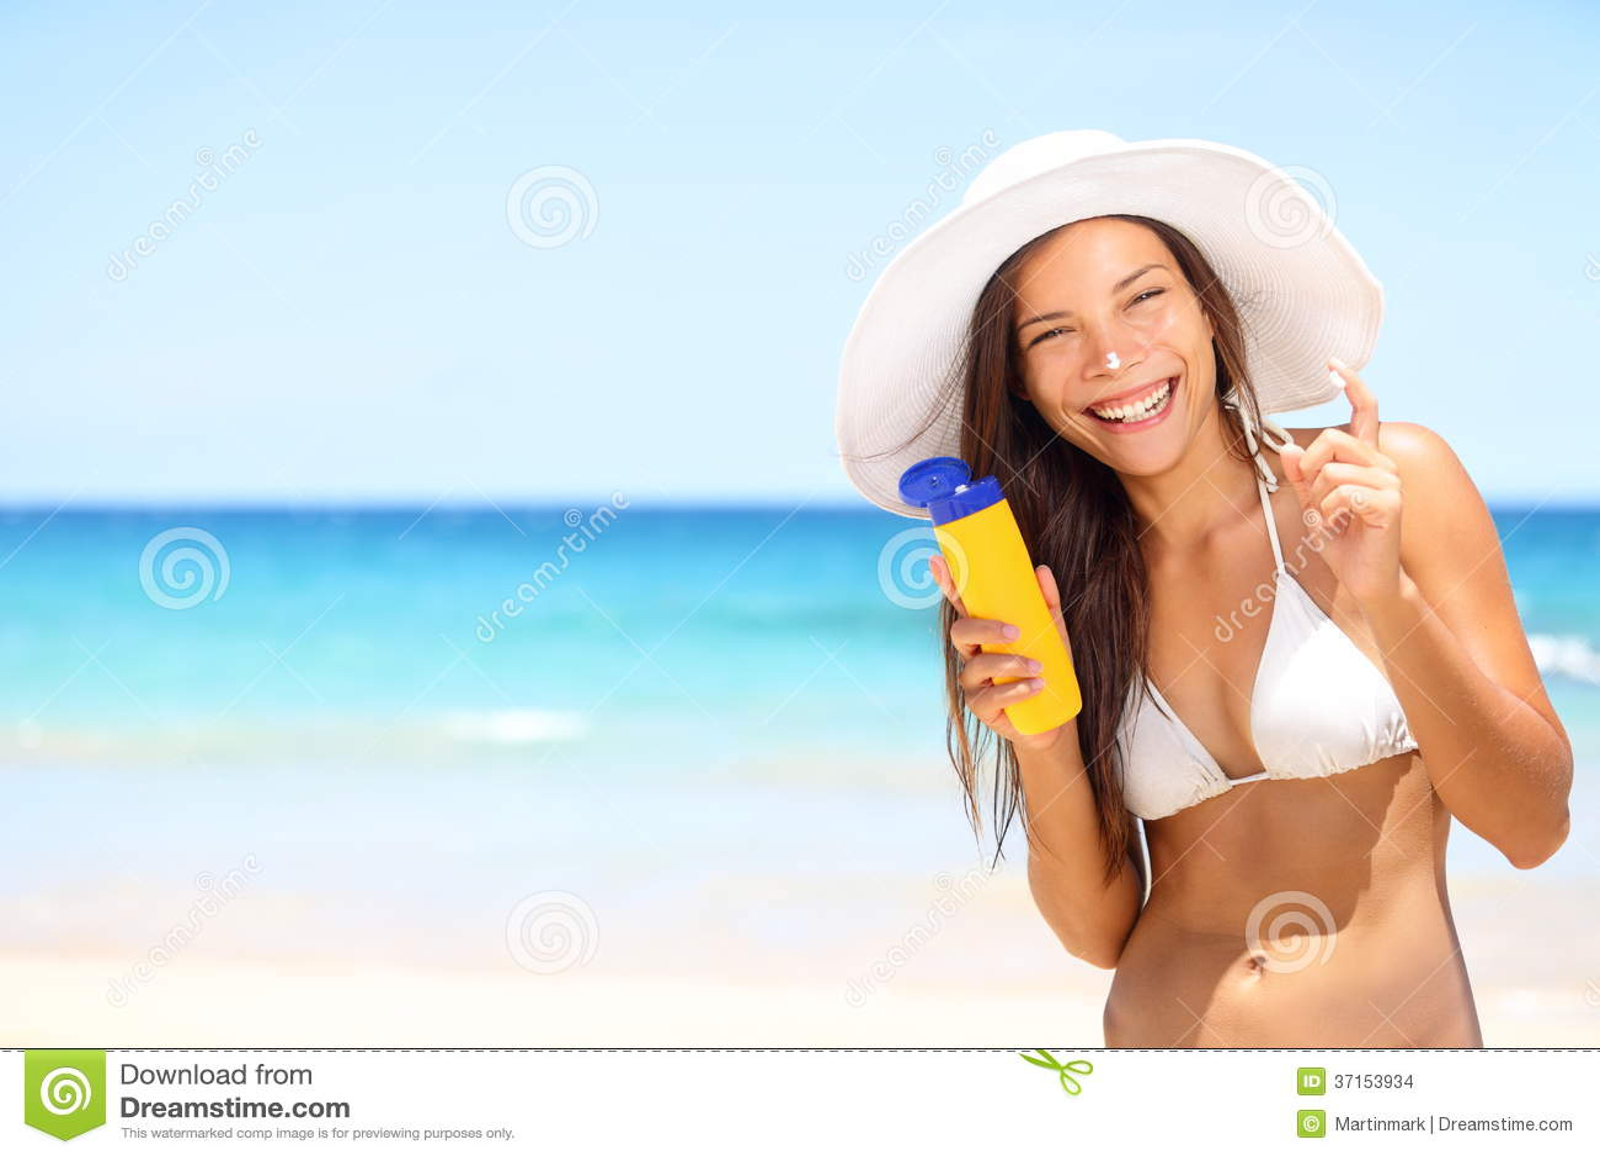 Beach applying sun cream 5